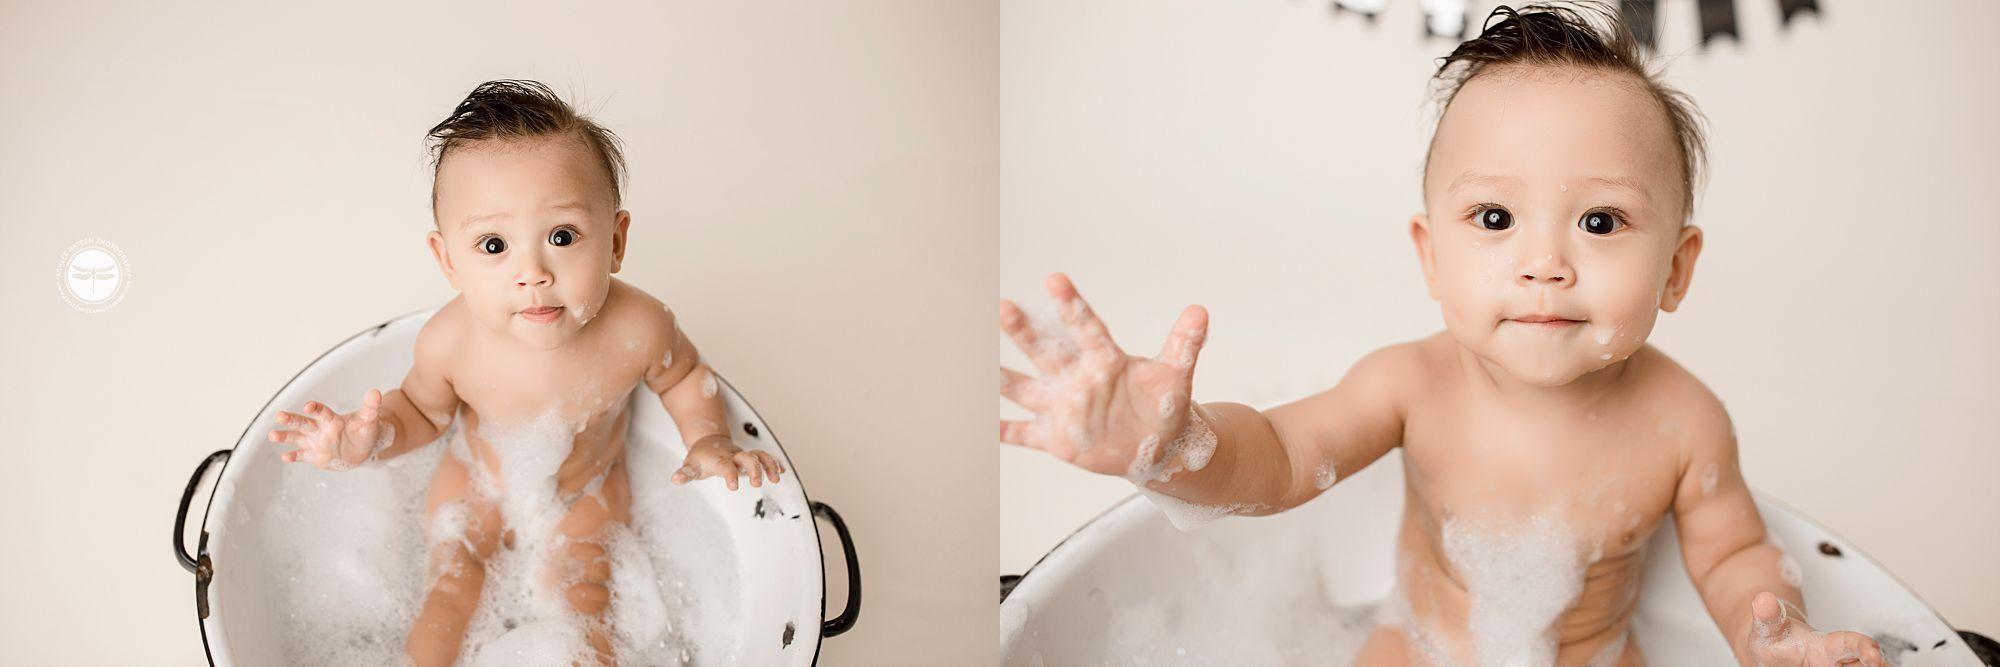 Post Smash bubble bath